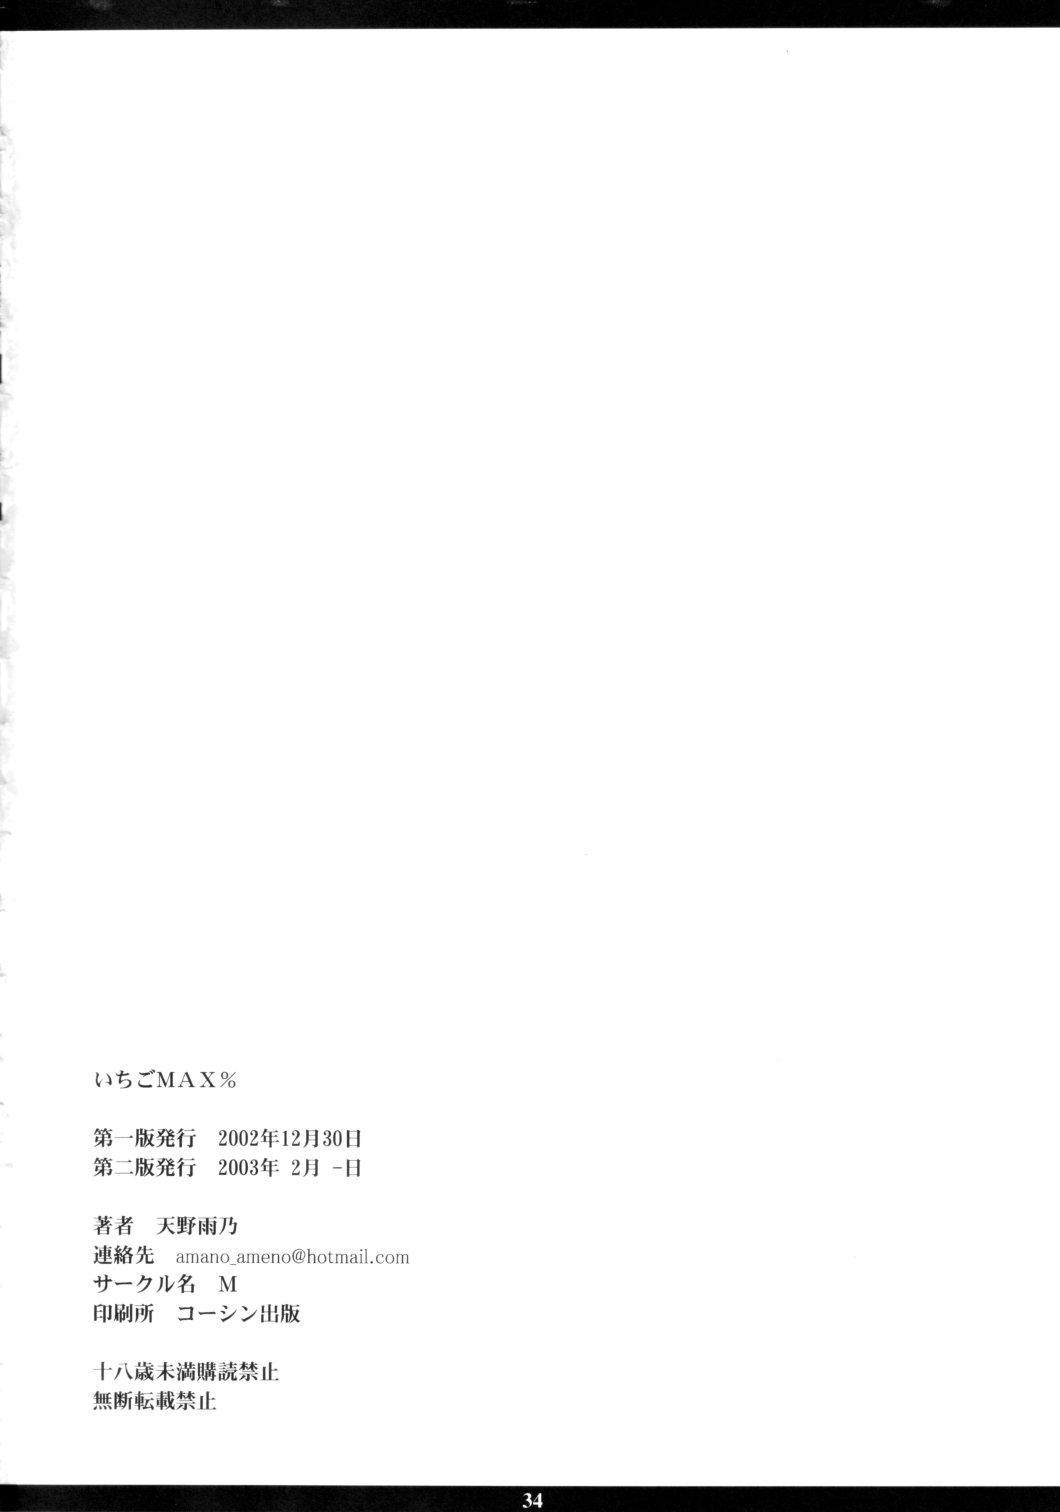 Ichigo MAX% 32